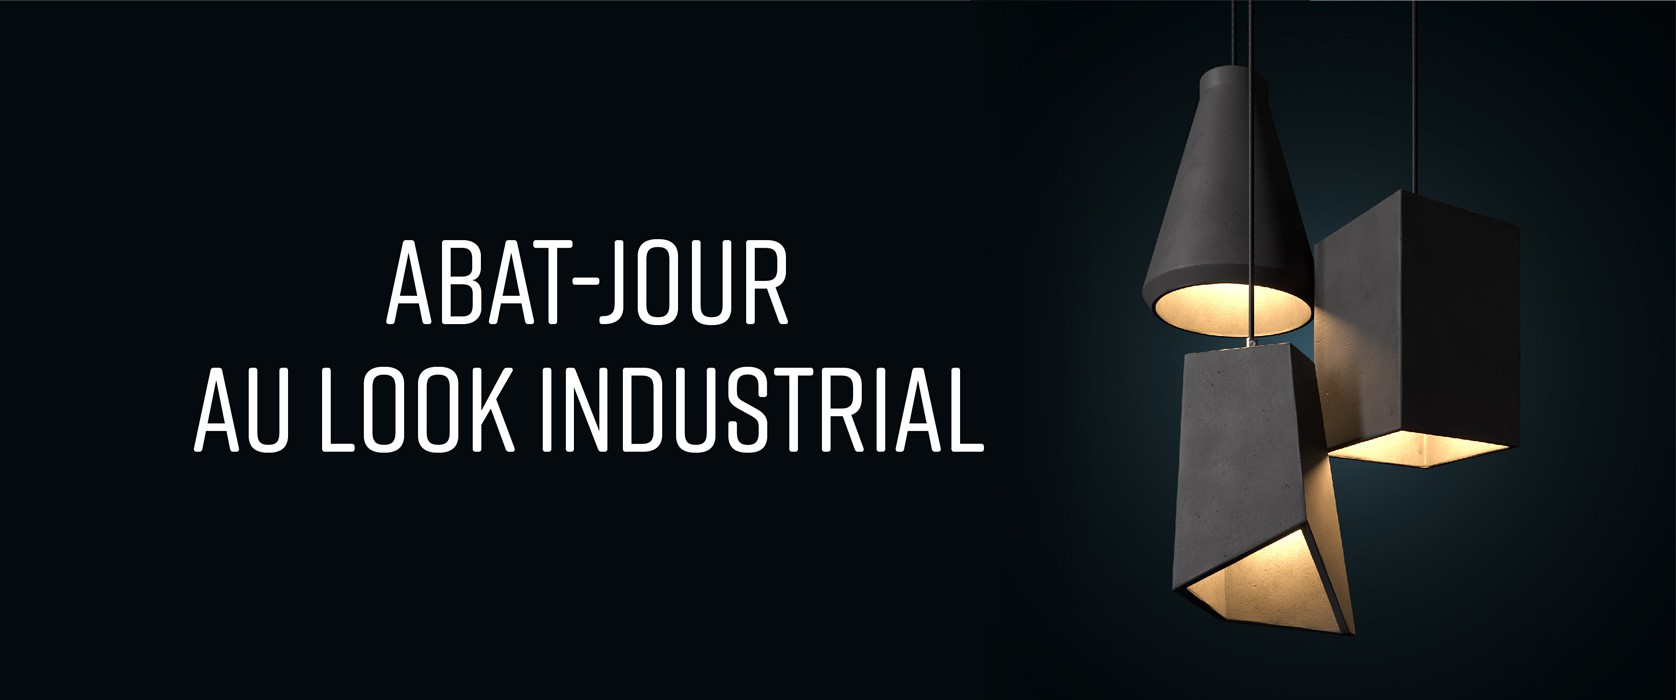 Abat-jour industrial